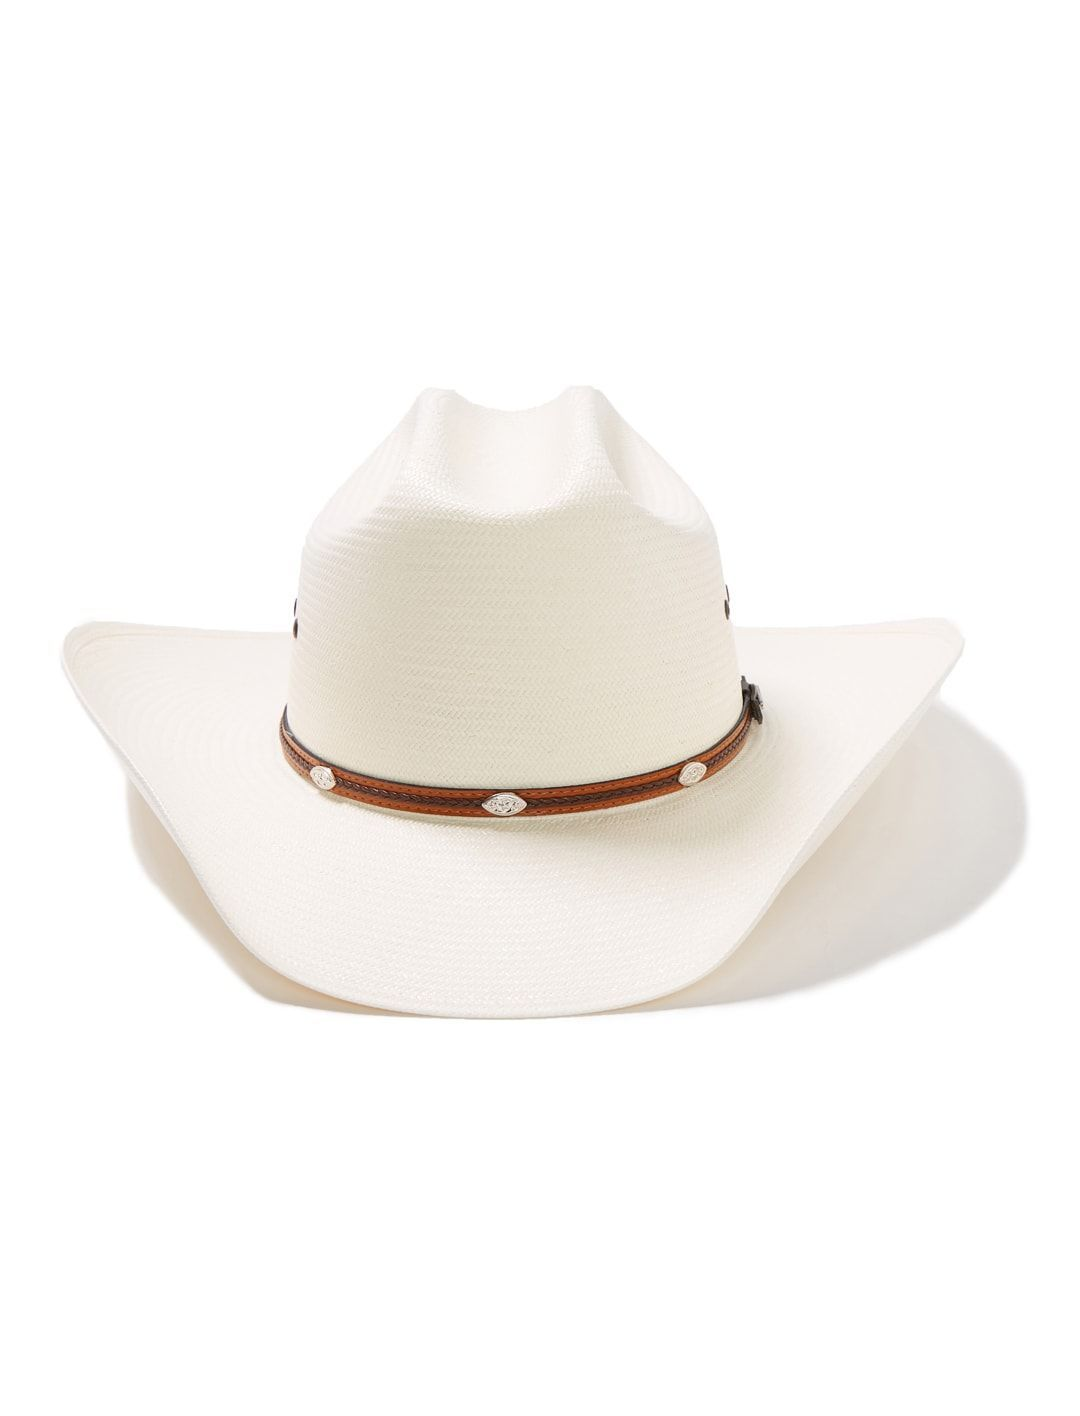 Stetson Men s ALAMO 8X STRAW COWBOY HAT SSALMO-3040 dff2f89806a